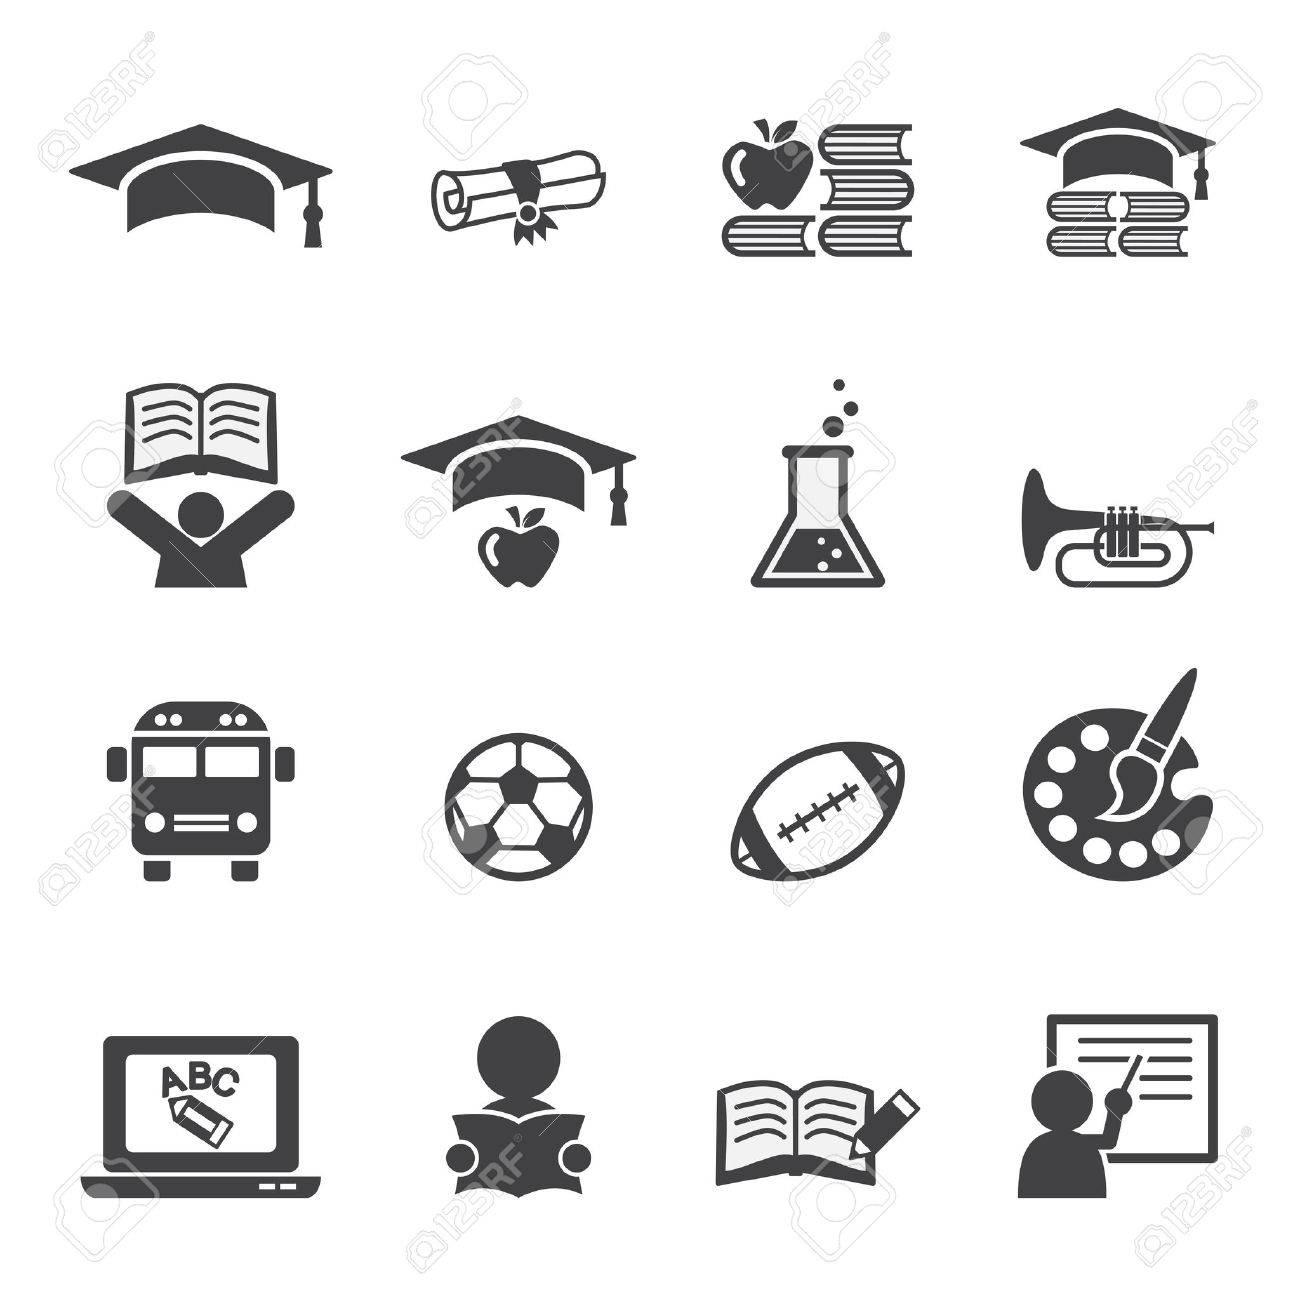 education icon set Stock Vector - 34580495